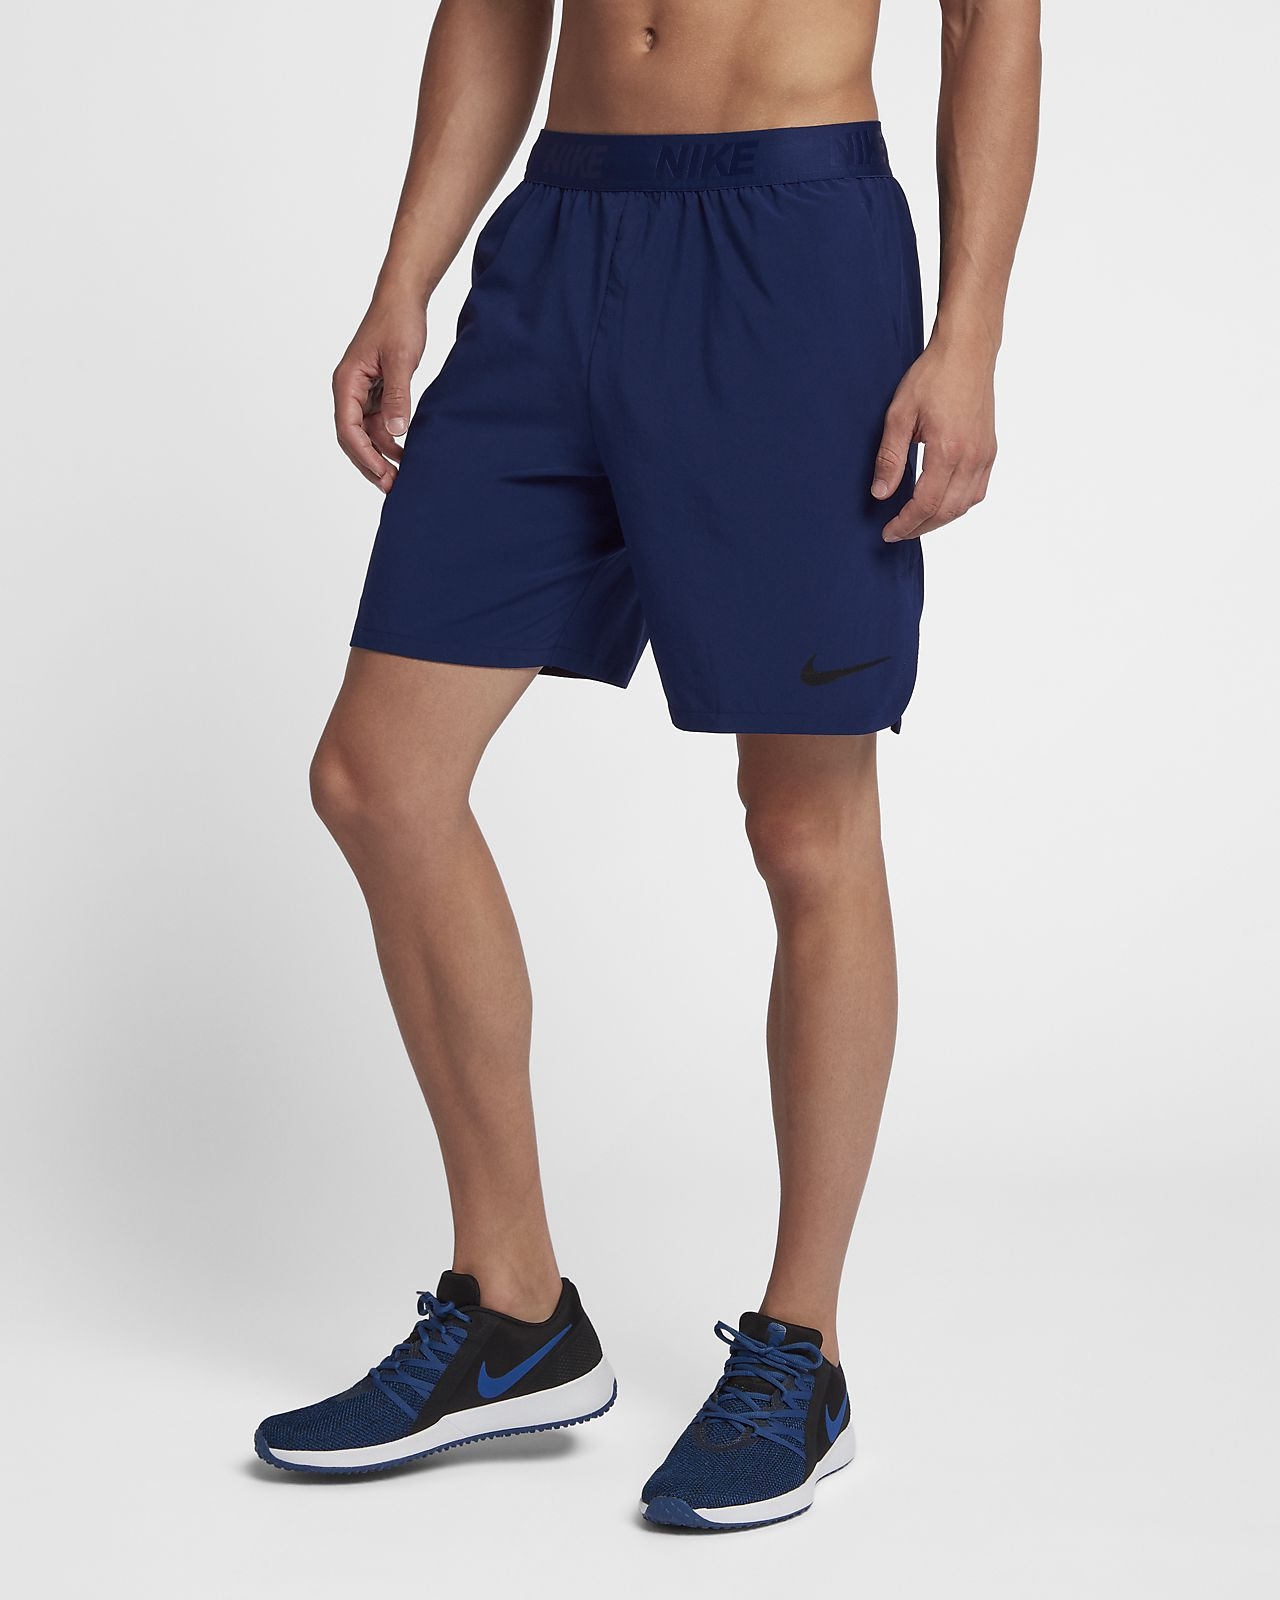 Nike Flex 20,5 cm-es férfi edzőrövidnadrág